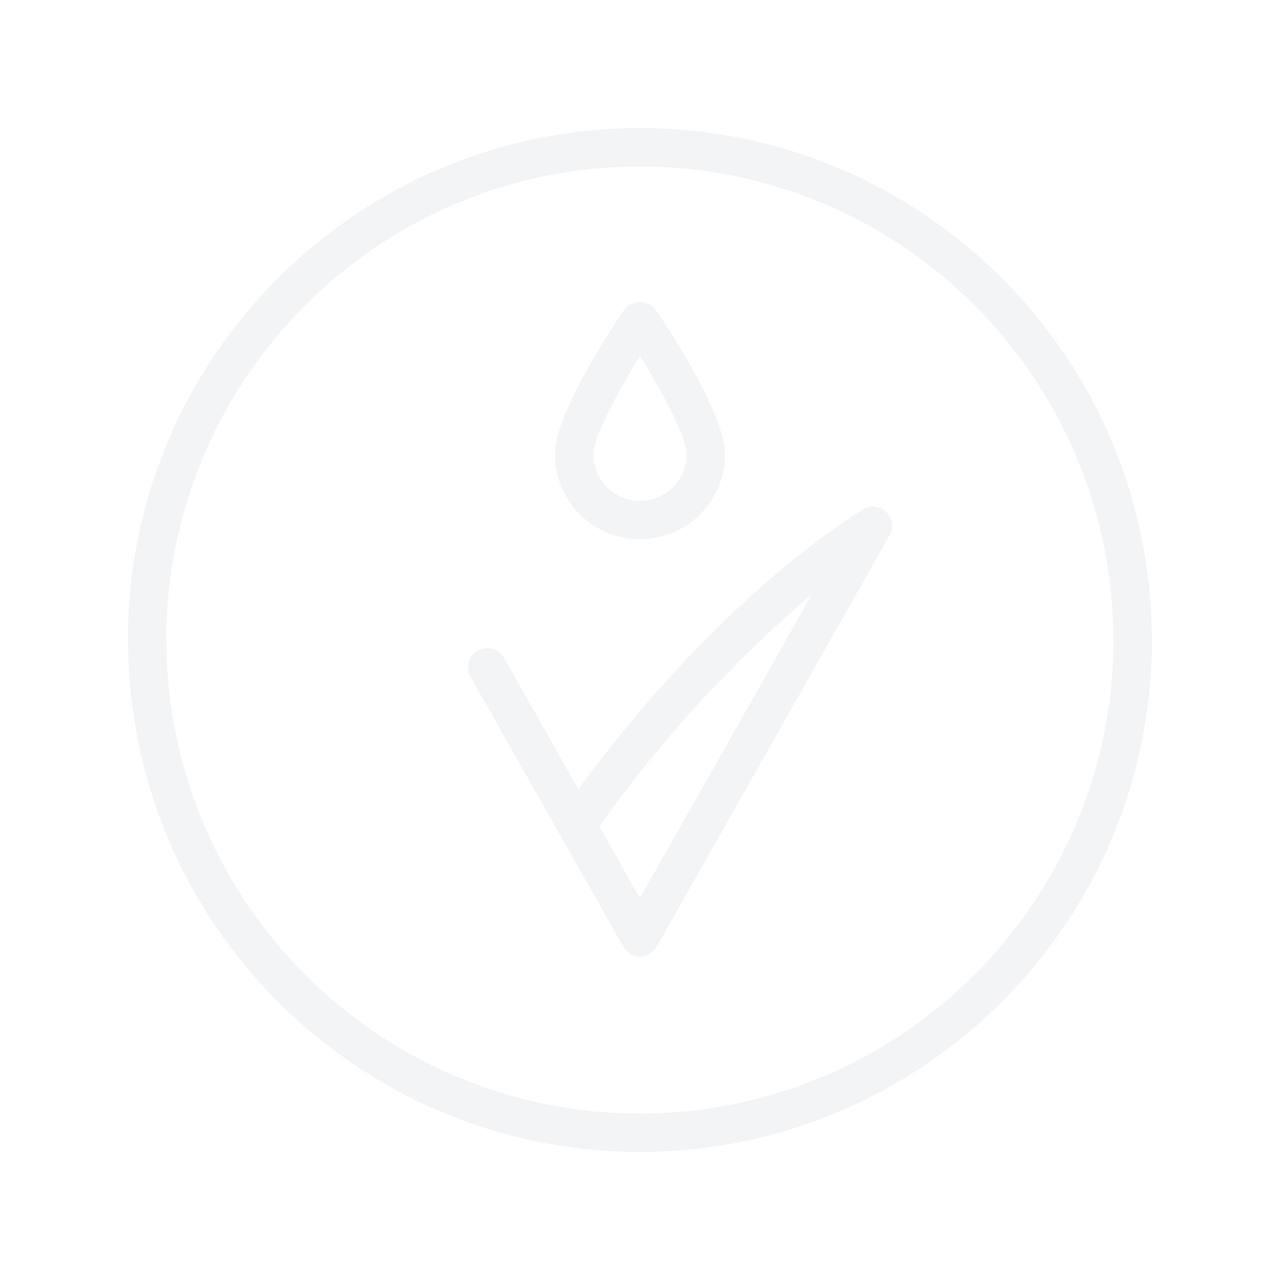 ARTDECO Skin Perfecting Make-Up Base 15ml